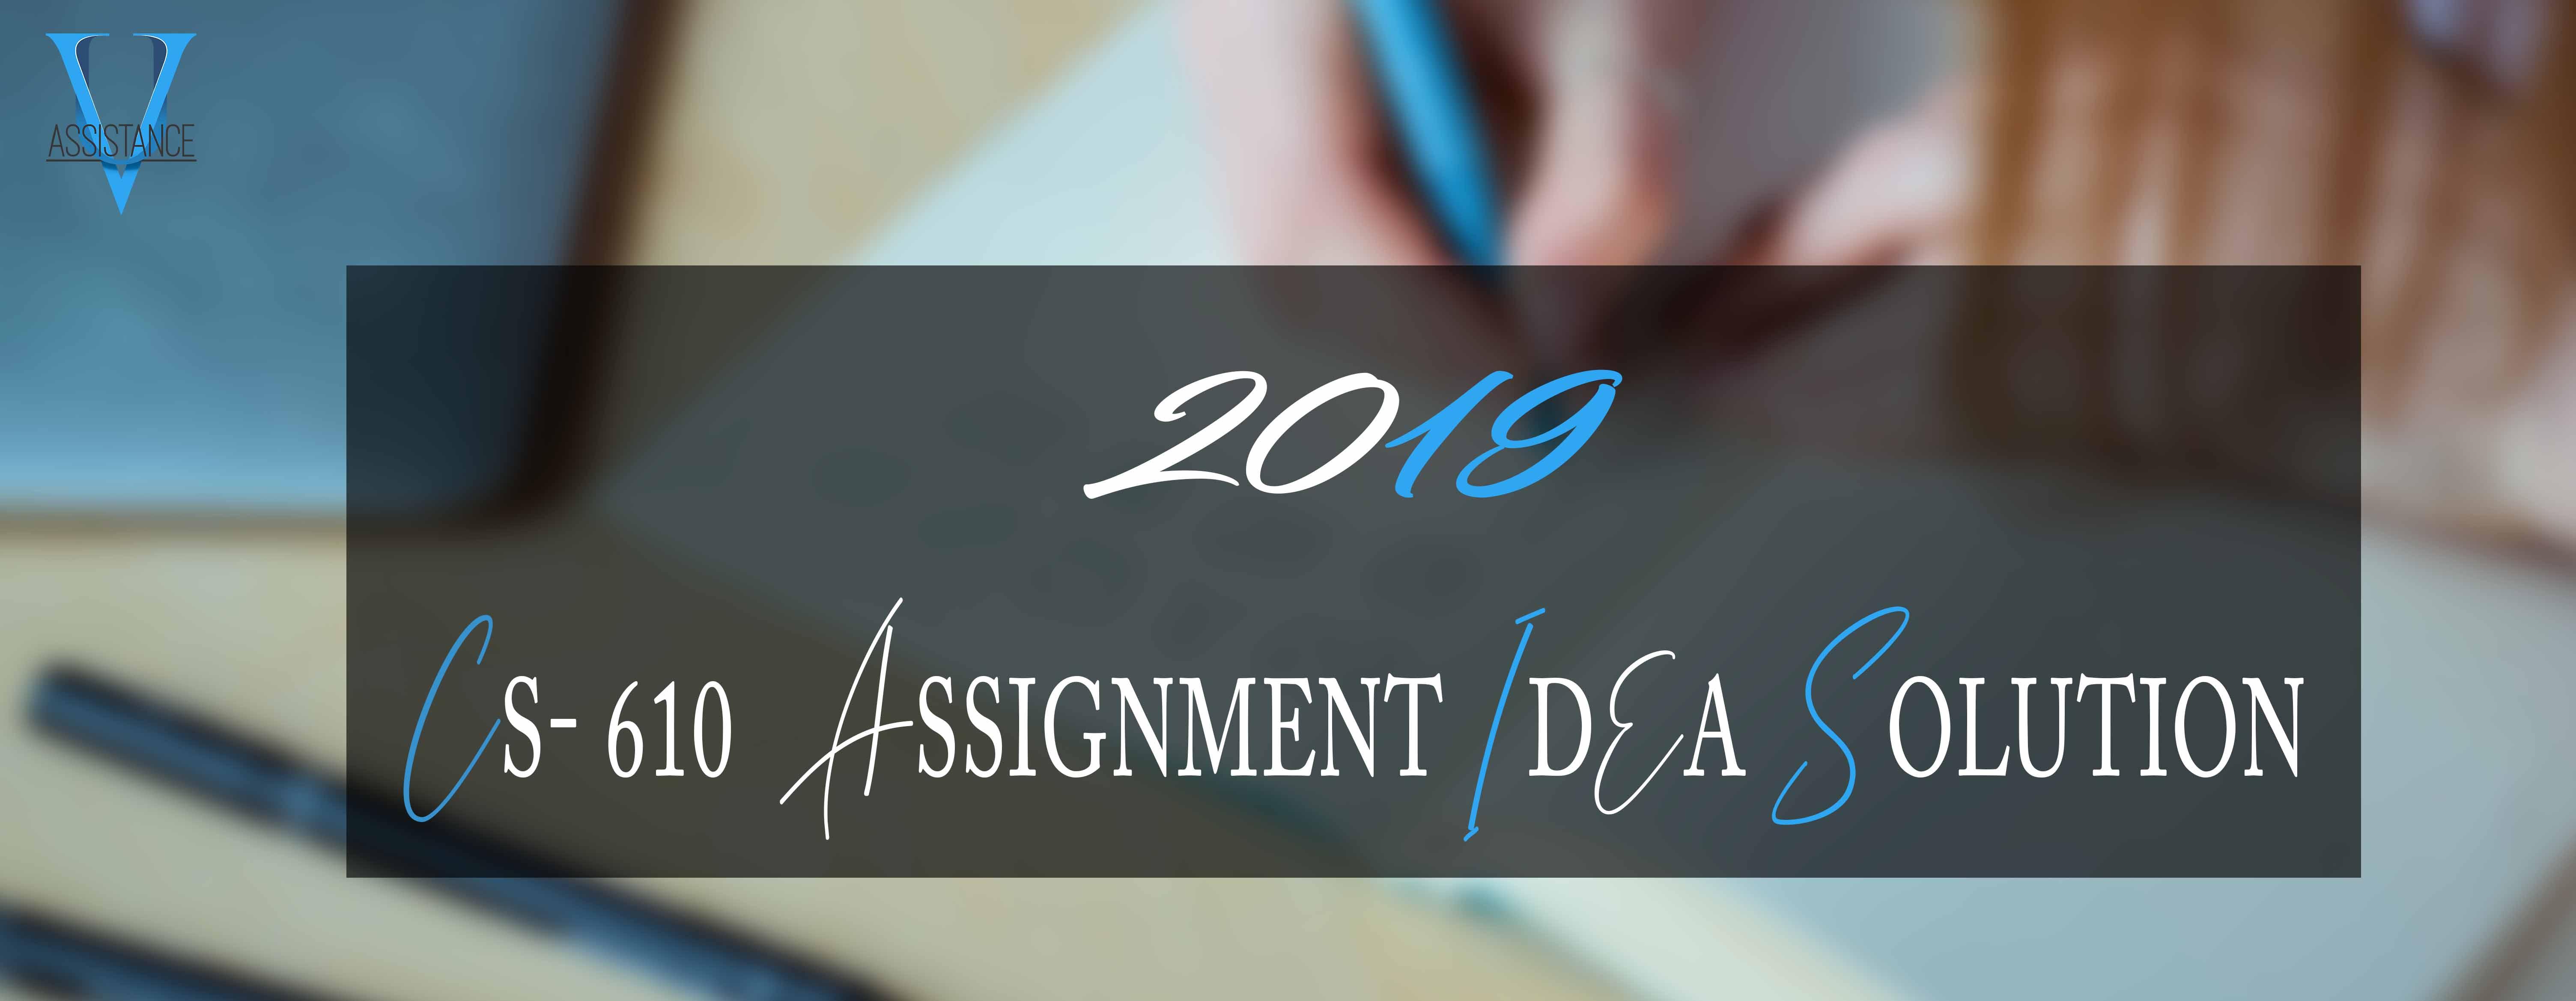 CS610 Assignment Solution 2019